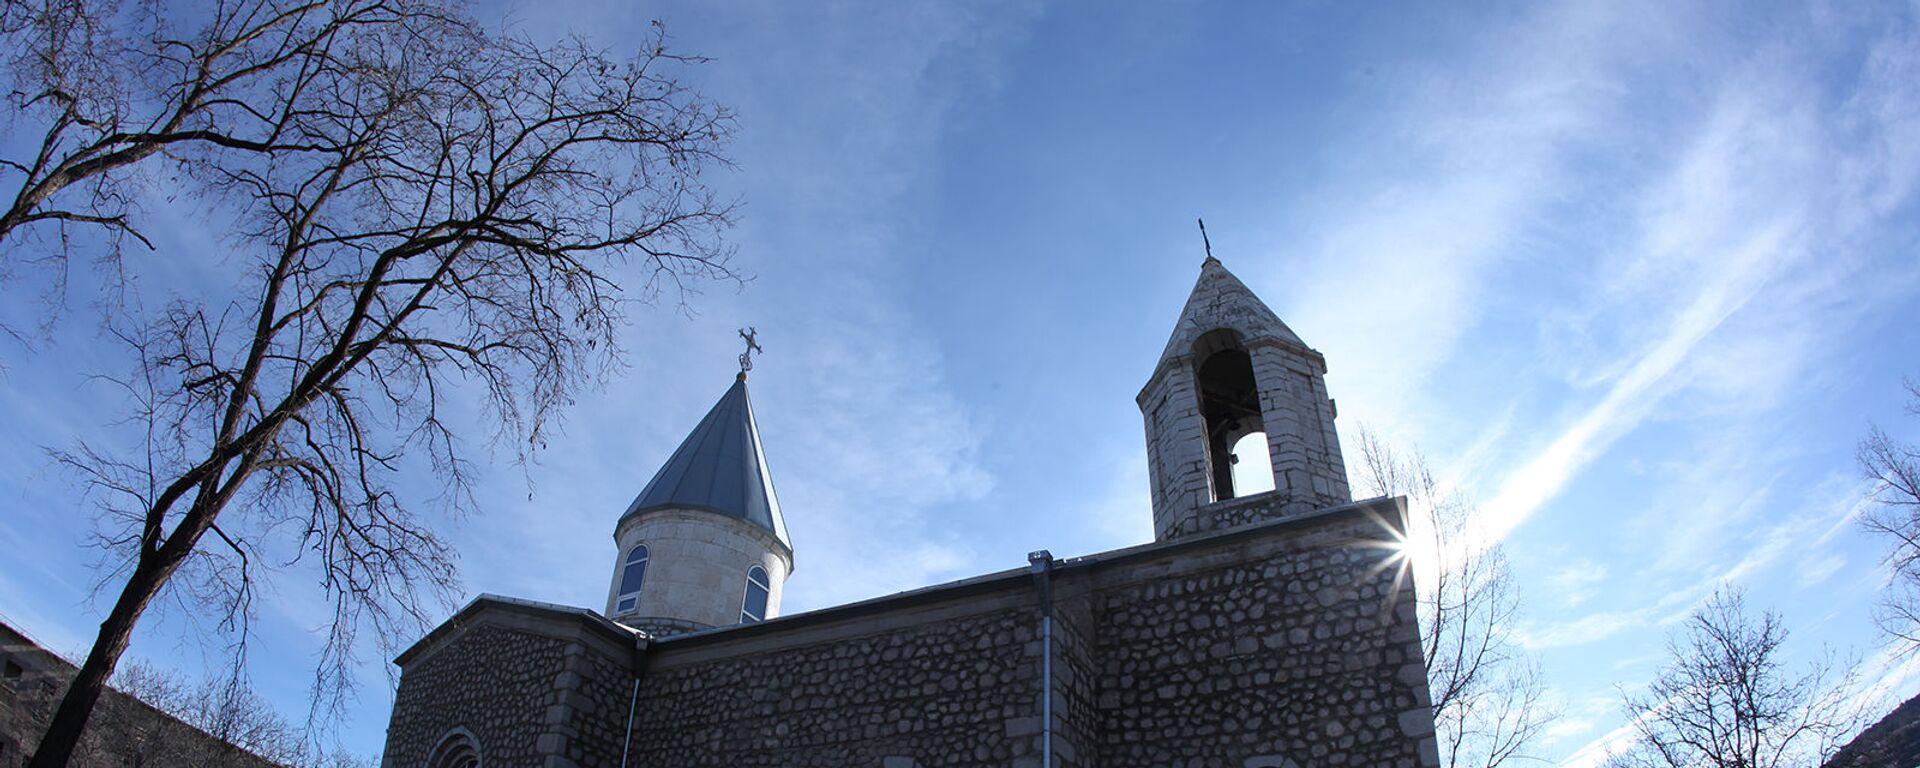 Церковь Канач Жам в Шуши, Карабах - Sputnik Արմենիա, 1920, 19.11.2020